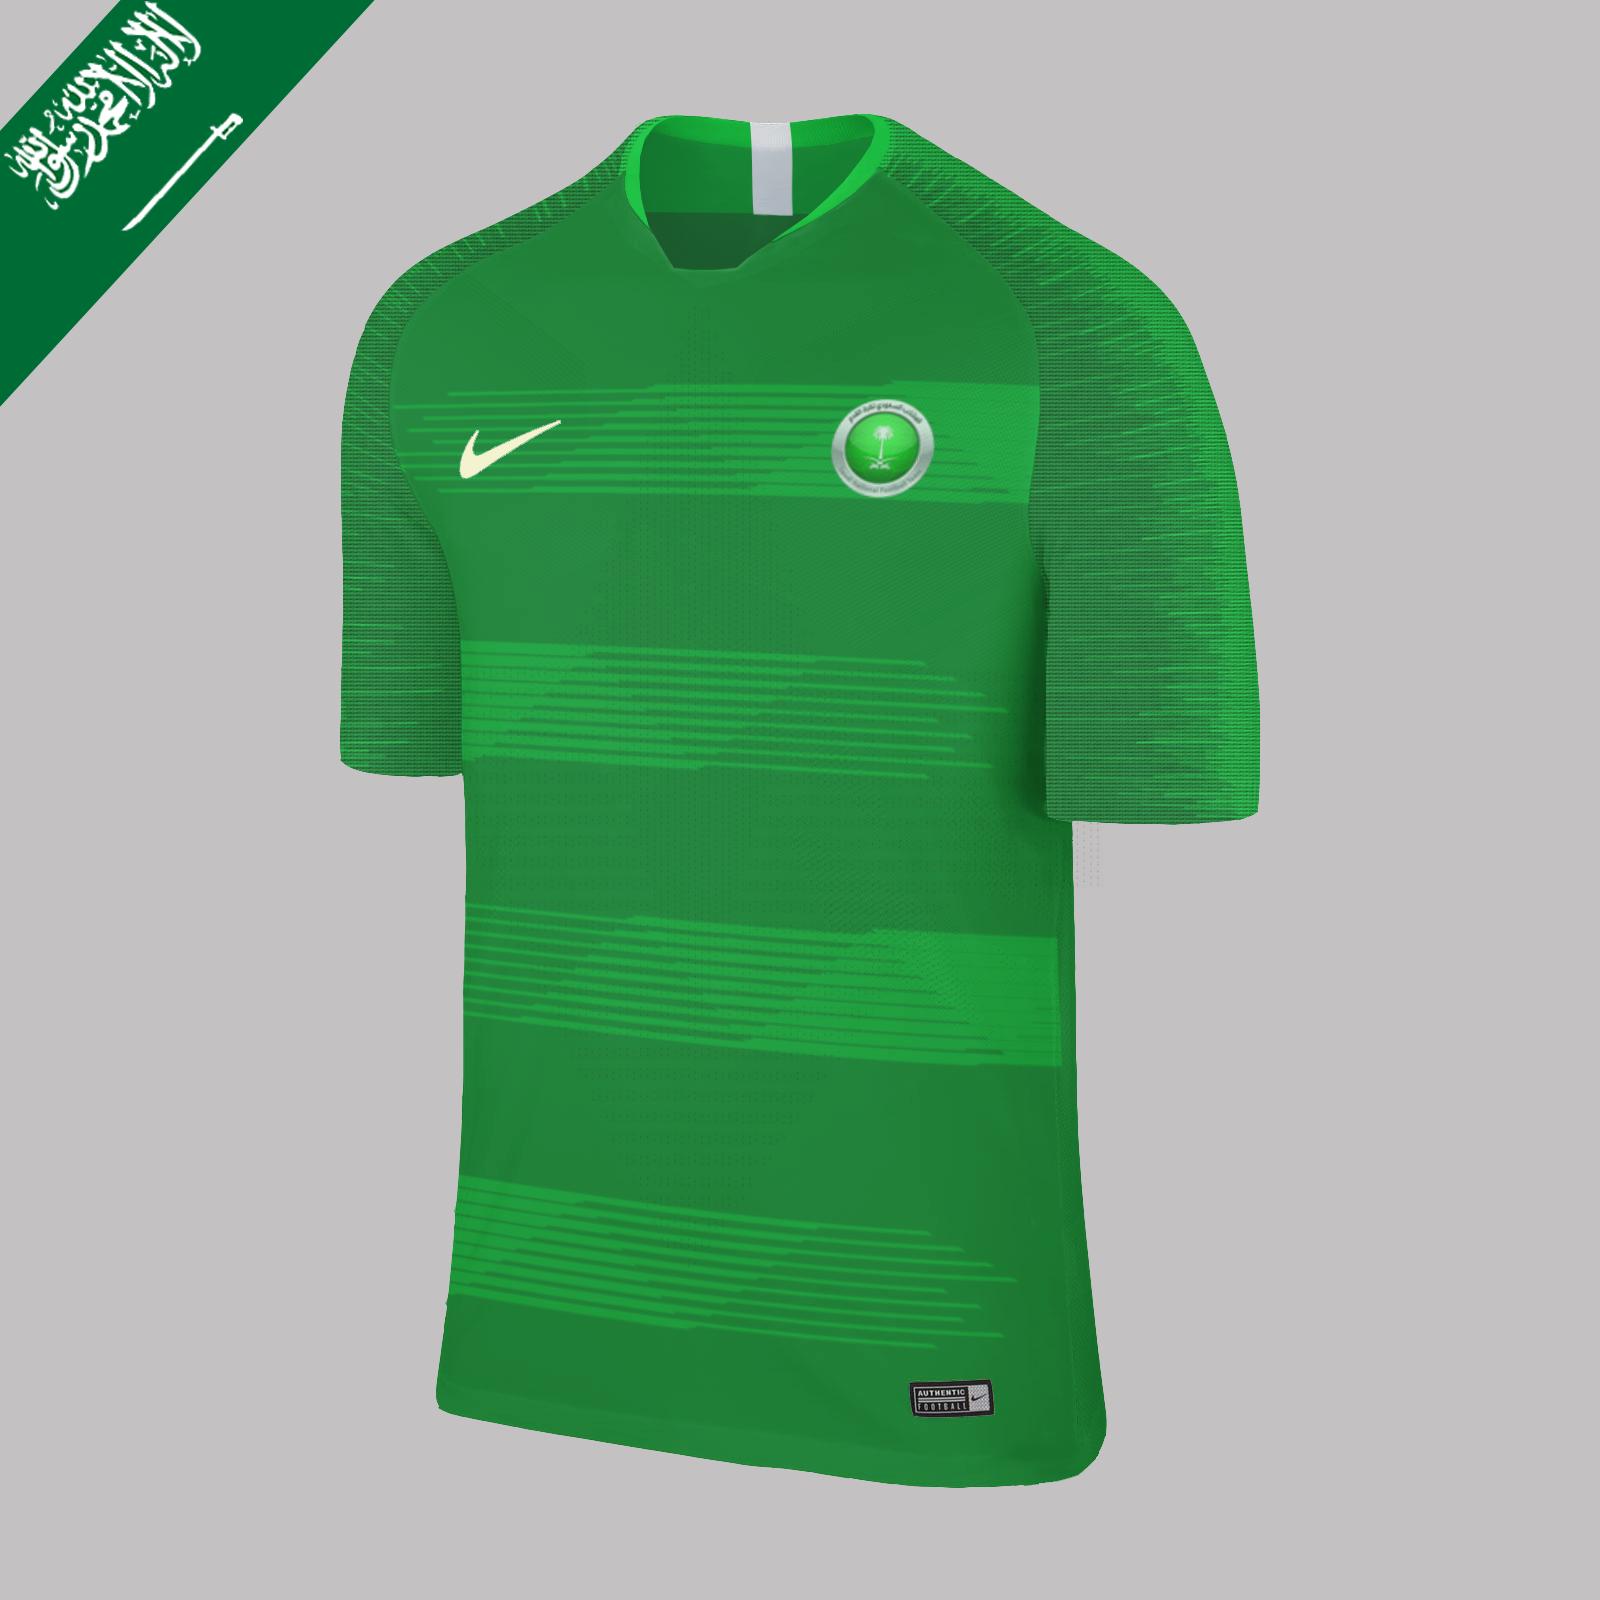 7590979ad Nike Saudi Arabia Home 2018 Concept